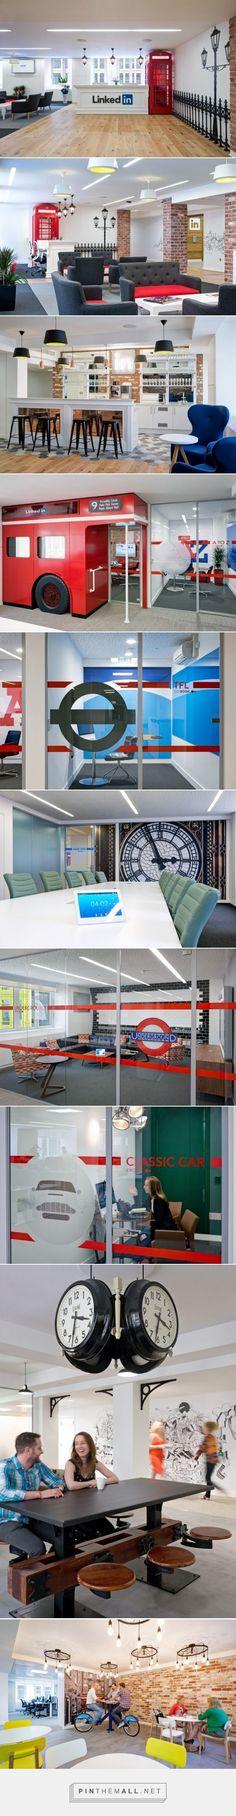 LinkedIn Office by Denton Associates, London – UK Corporate Office Design, Office Branding, Office Space Design, Corporate Interiors, Workspace Design, Office Interior Design, Office Interiors, Best Office, Cool Office